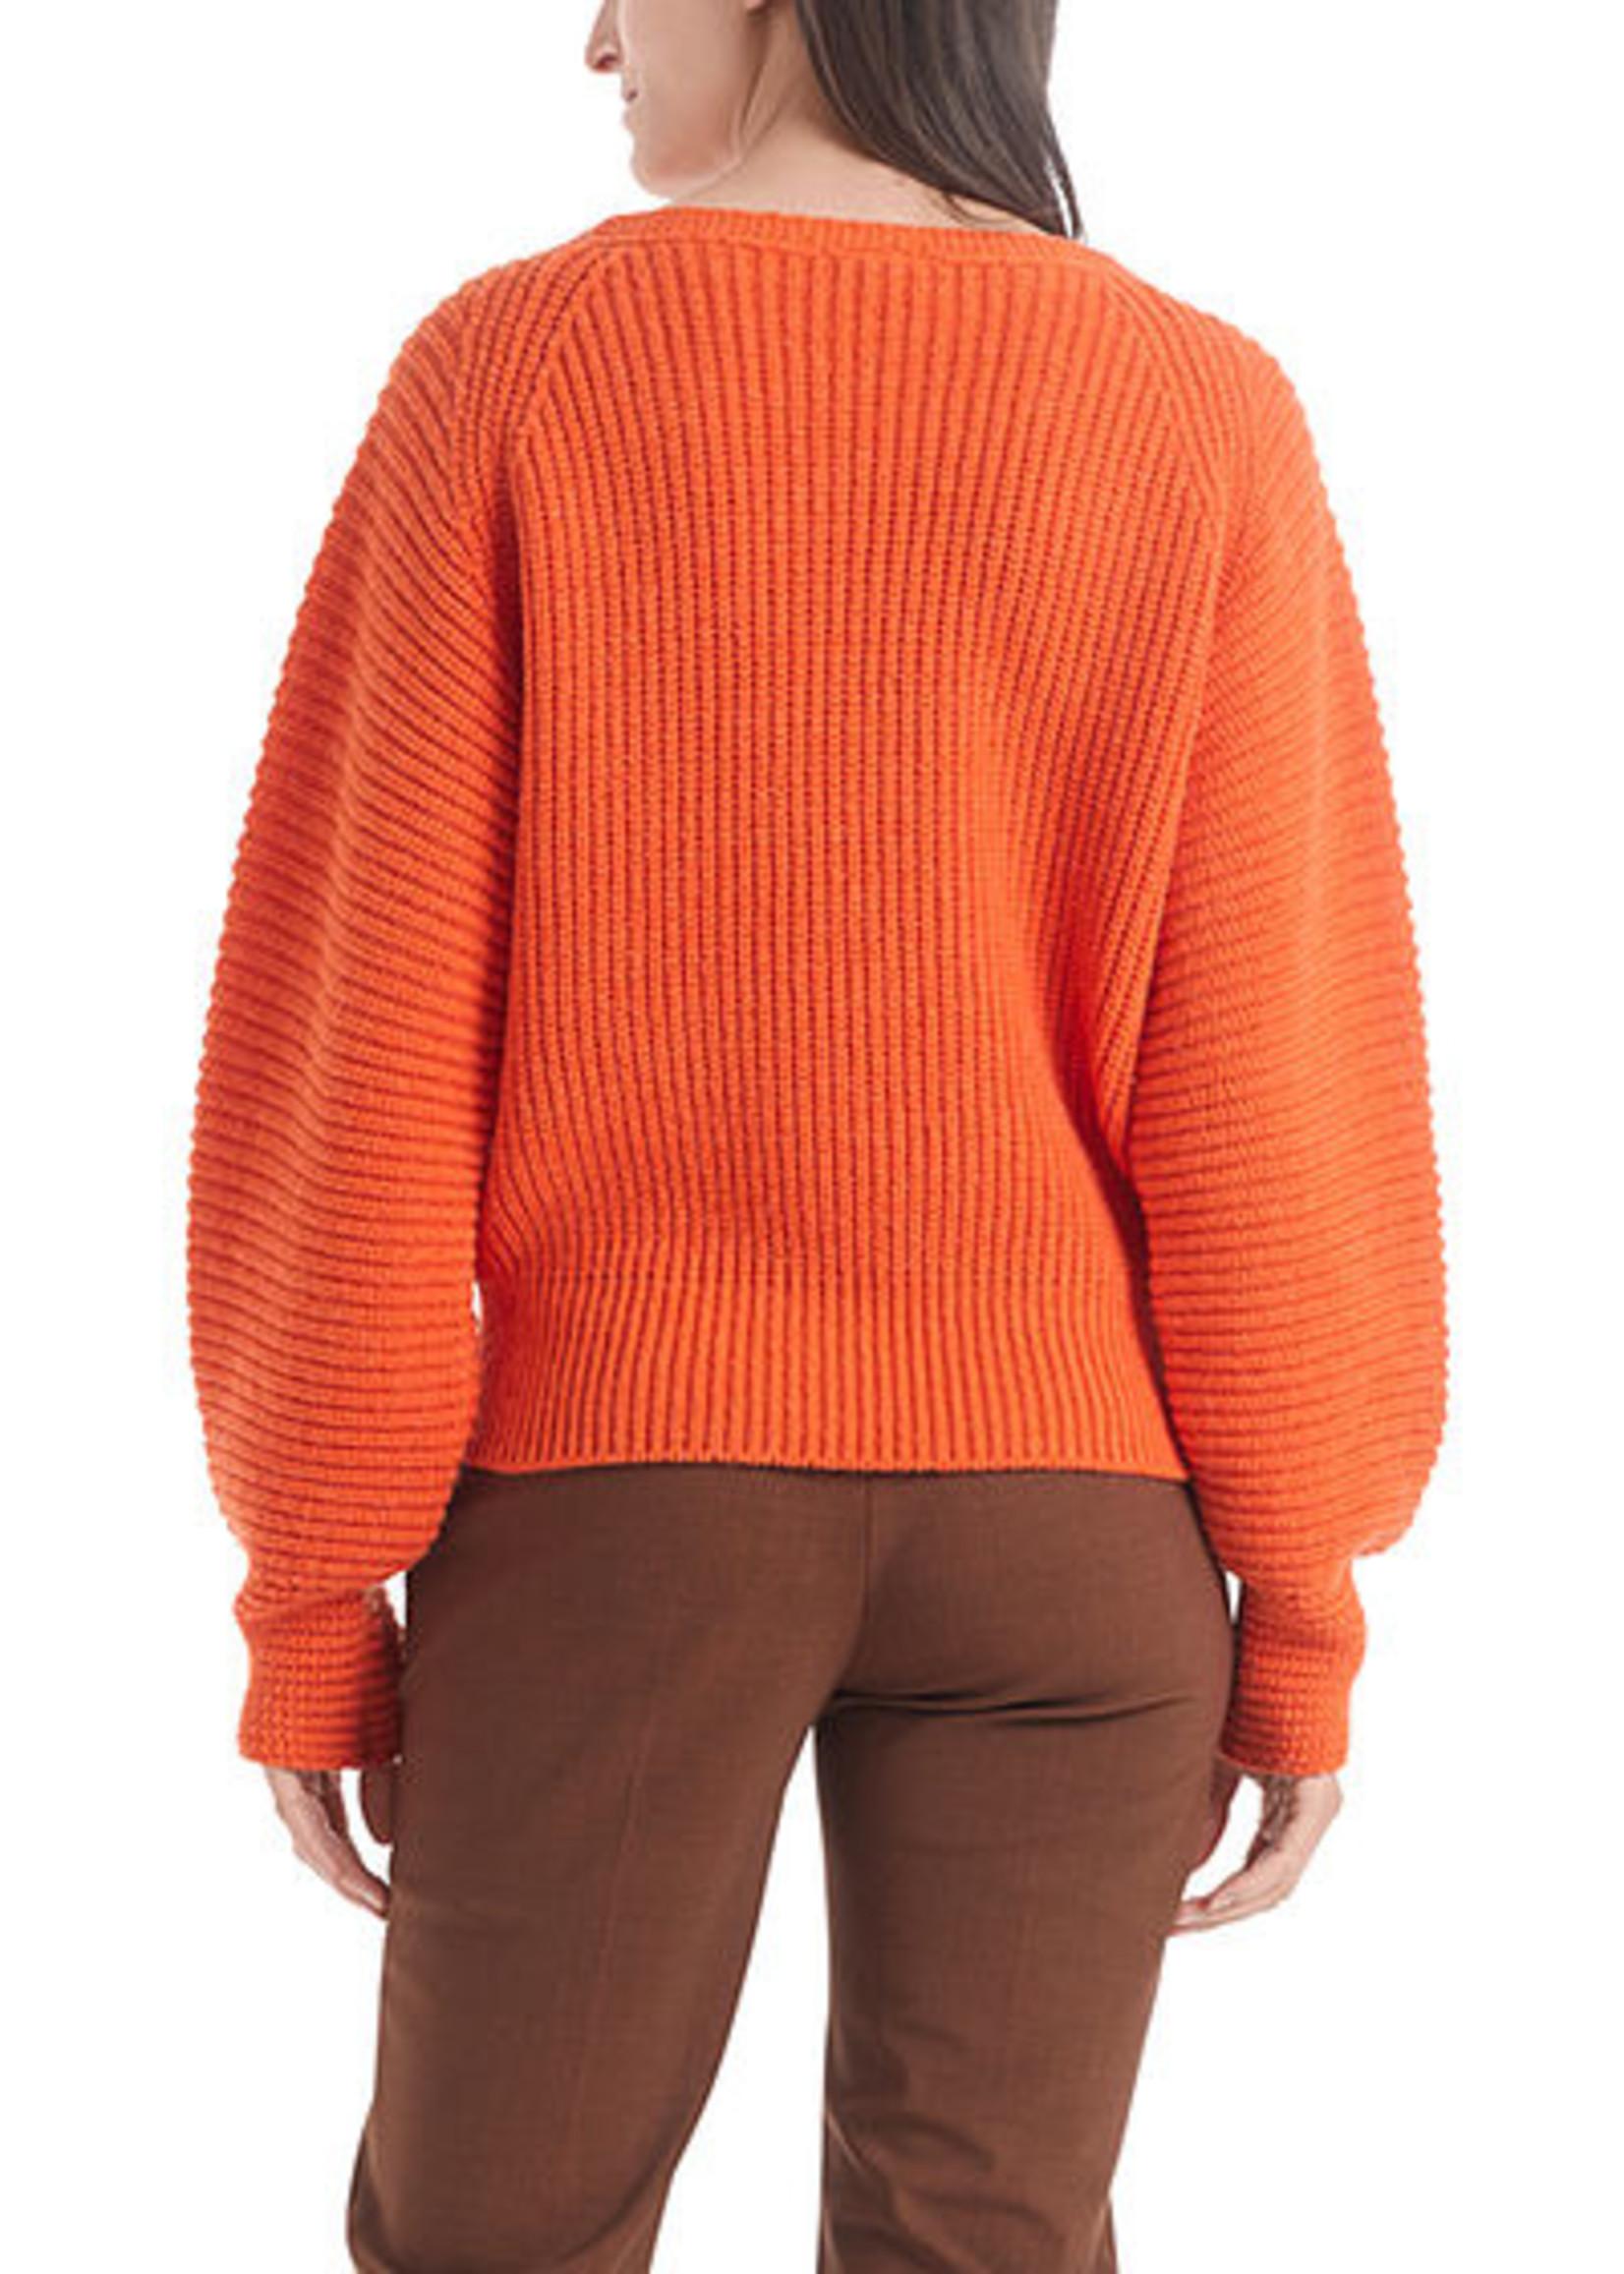 Sweater RC 41.49 M18 hokkaido